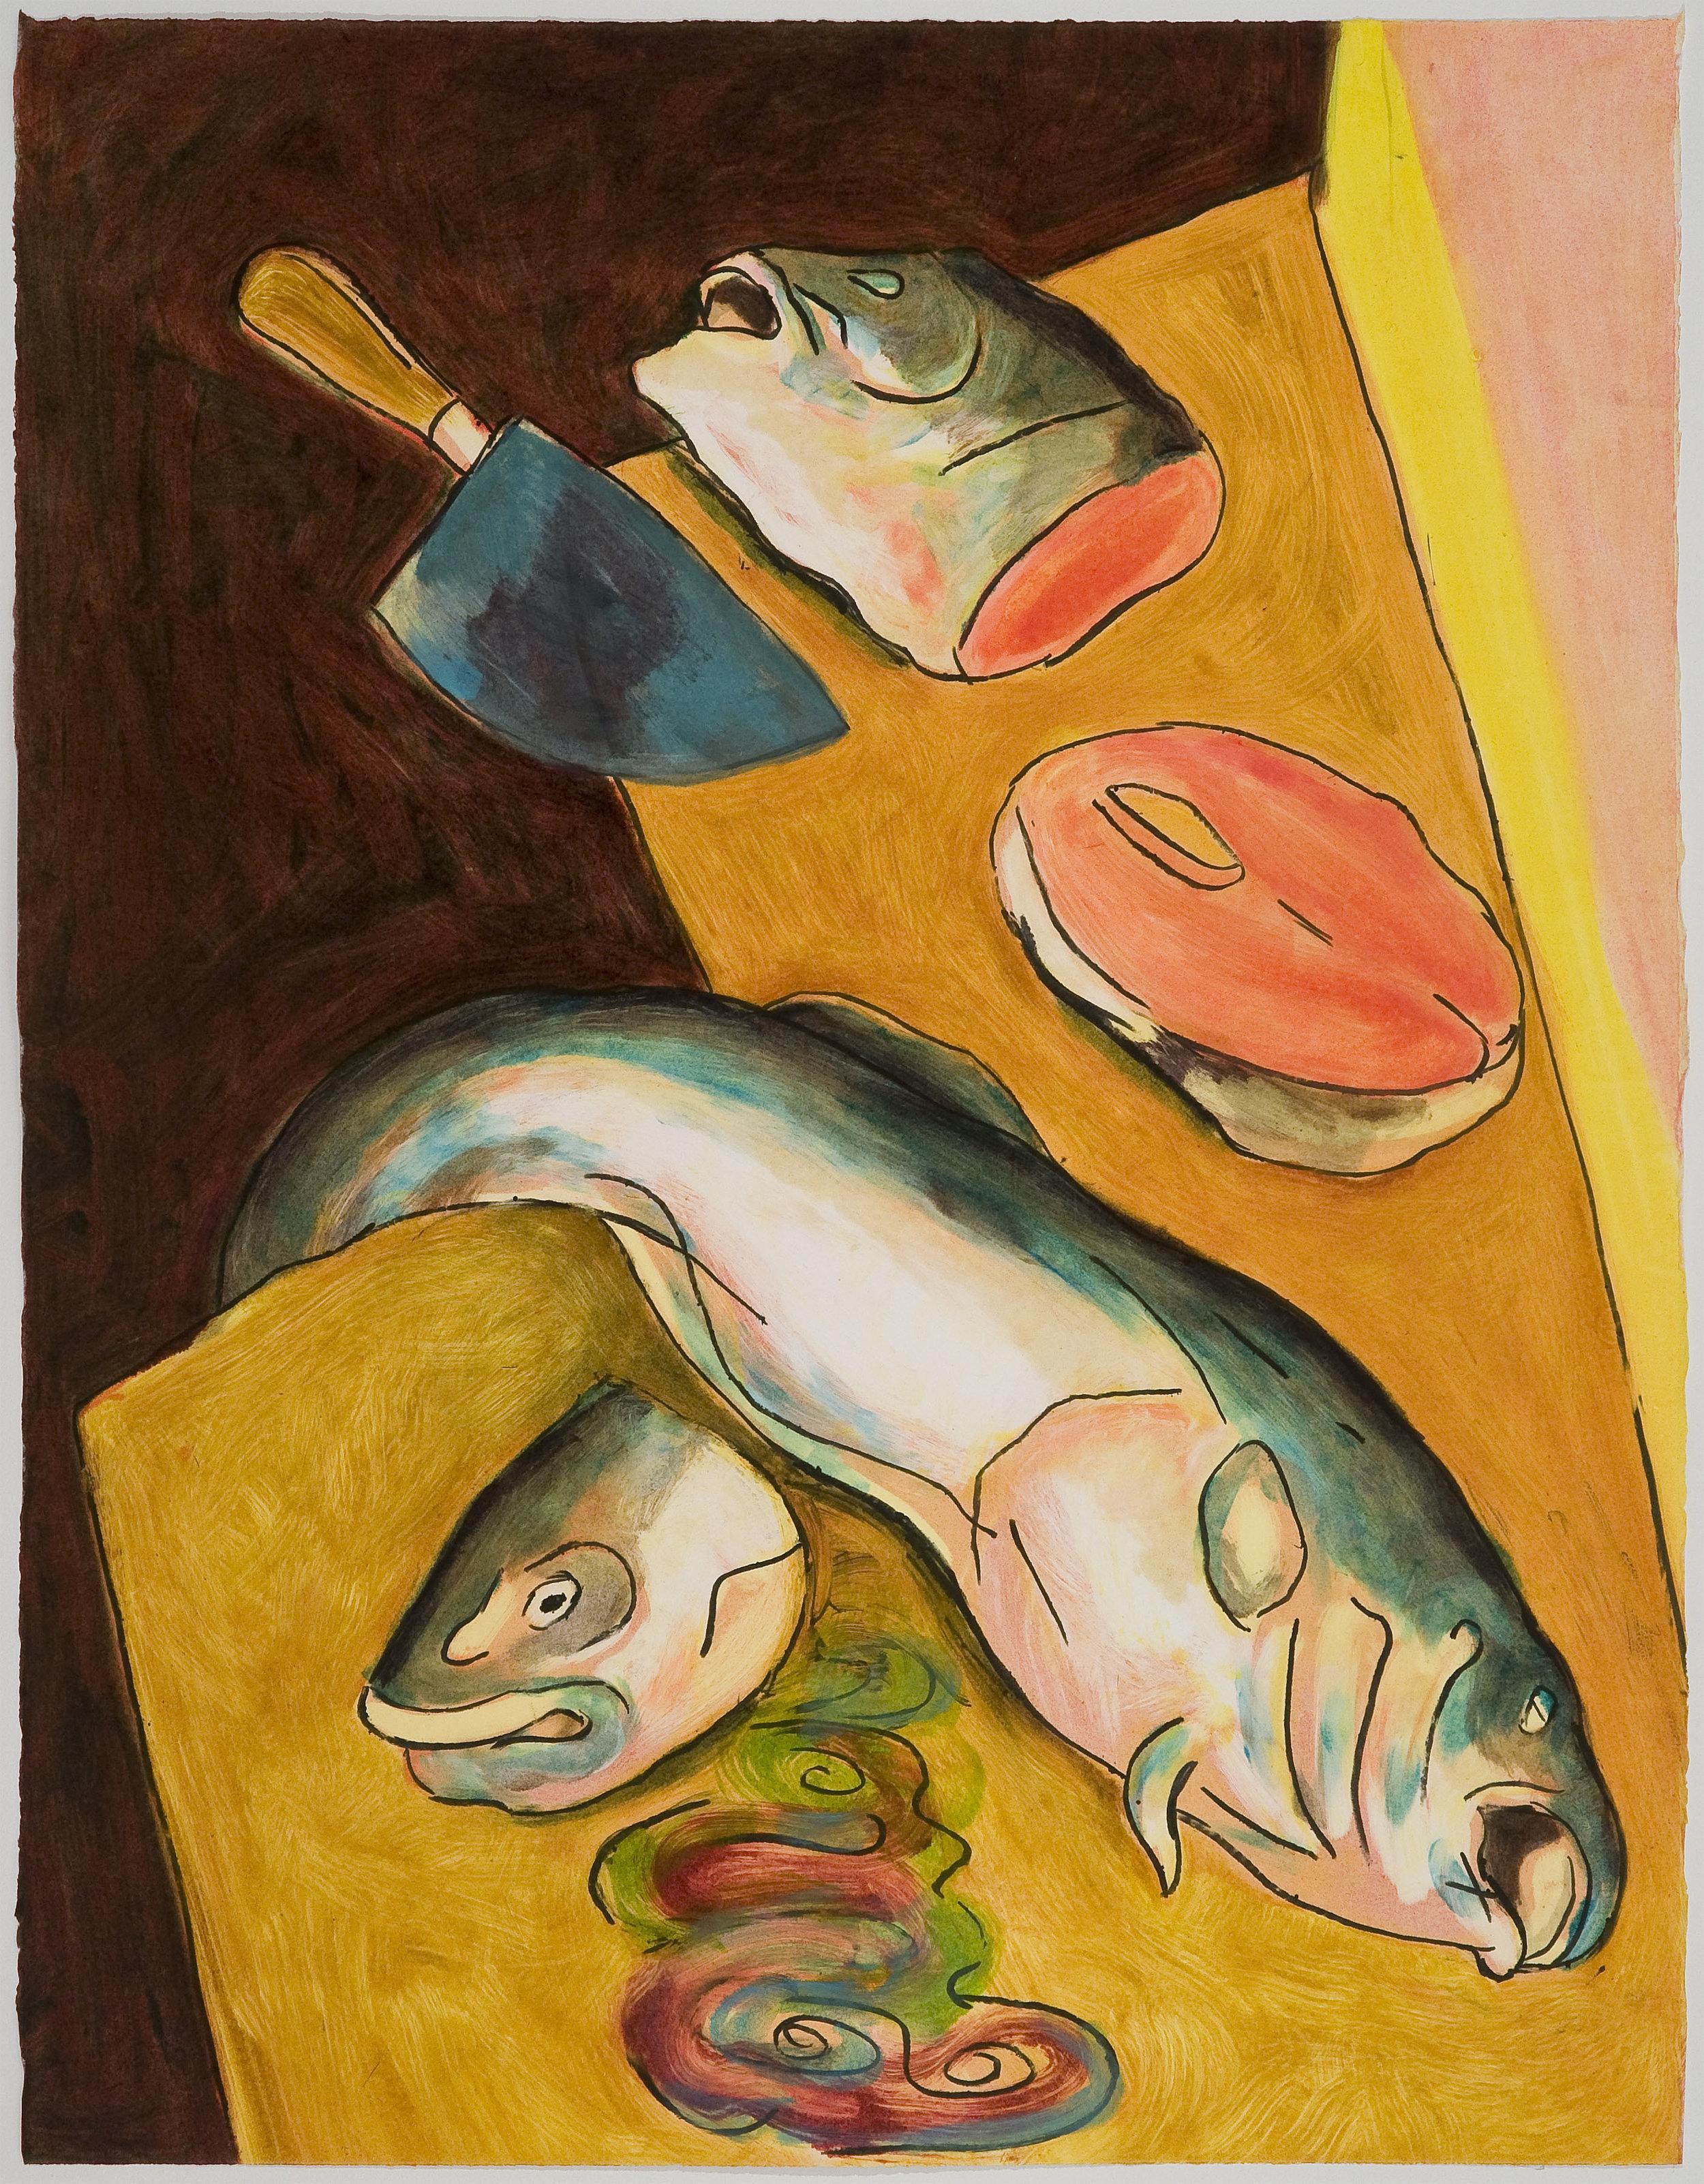 02-chopped-fish-heads-01.jpg